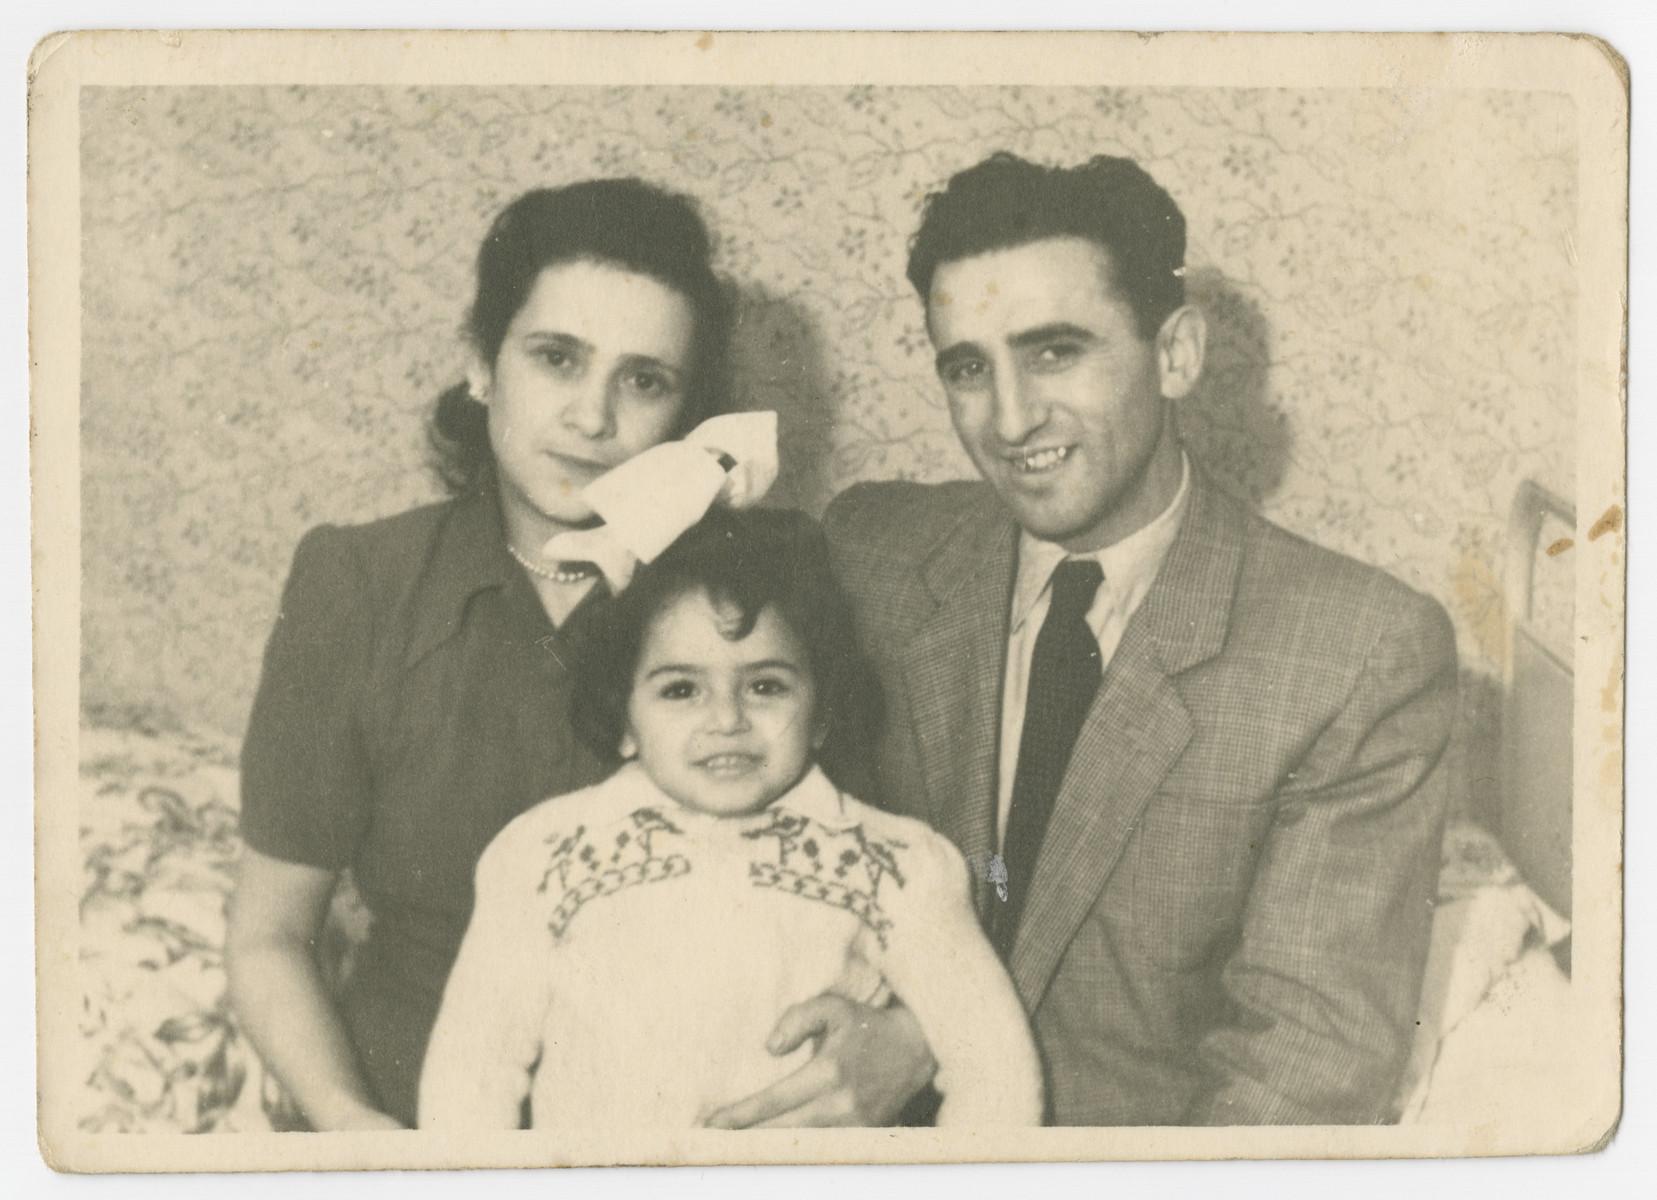 Family portrait of Malka, Abram and Ellen Zinger in the Bergen-Belsen displaced persons camp.